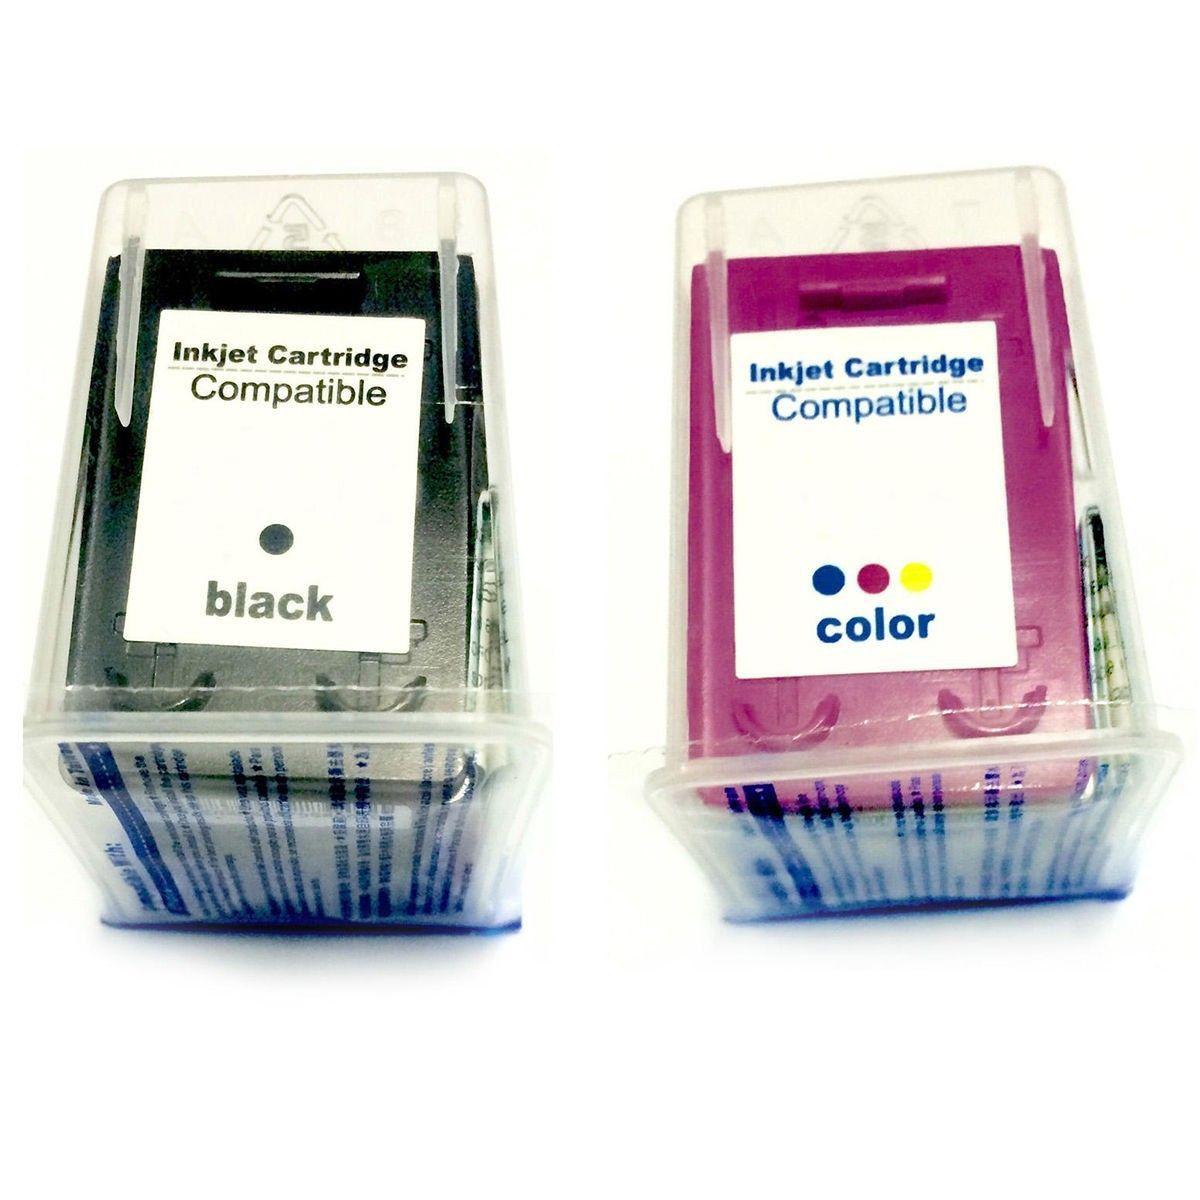 Compatível: Kit Colorido de Cartucho de Tinta 61xl 61 para Impressora HP 1000 J110 1050 1051 1010 2050 2500 2540